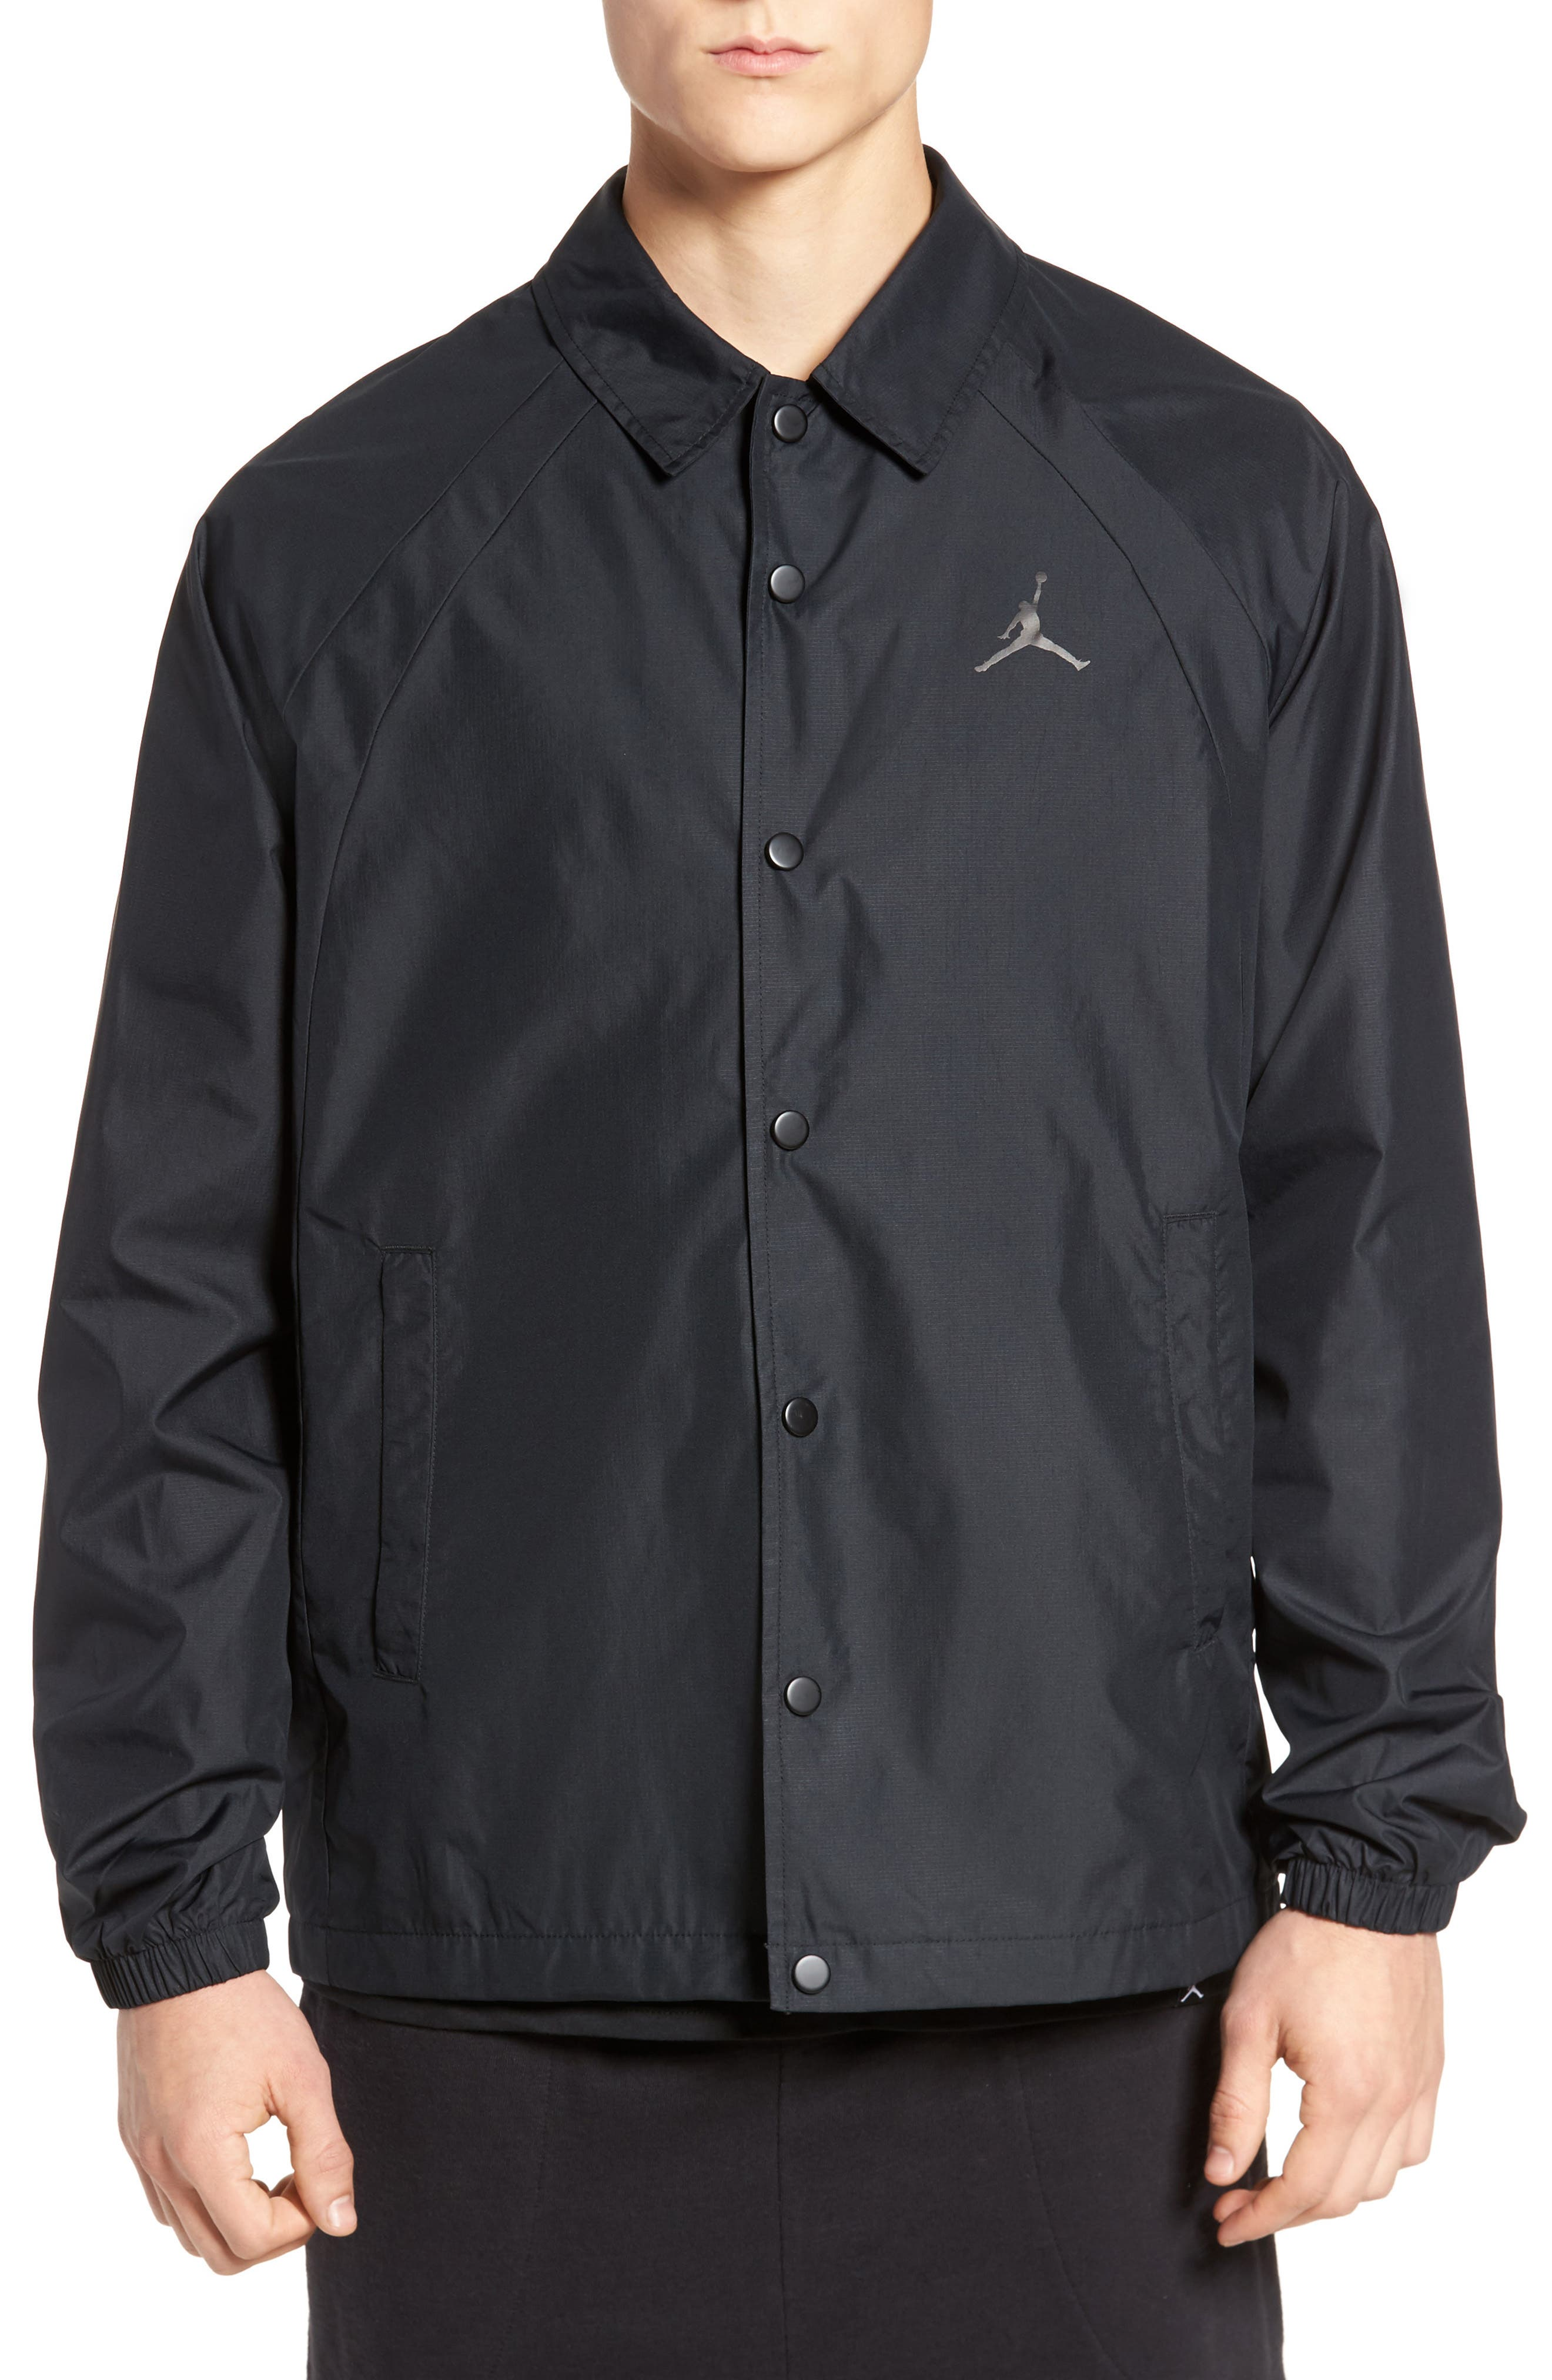 Nike Wings Coach's Jacket,                         Main,                         color, Black/ Black